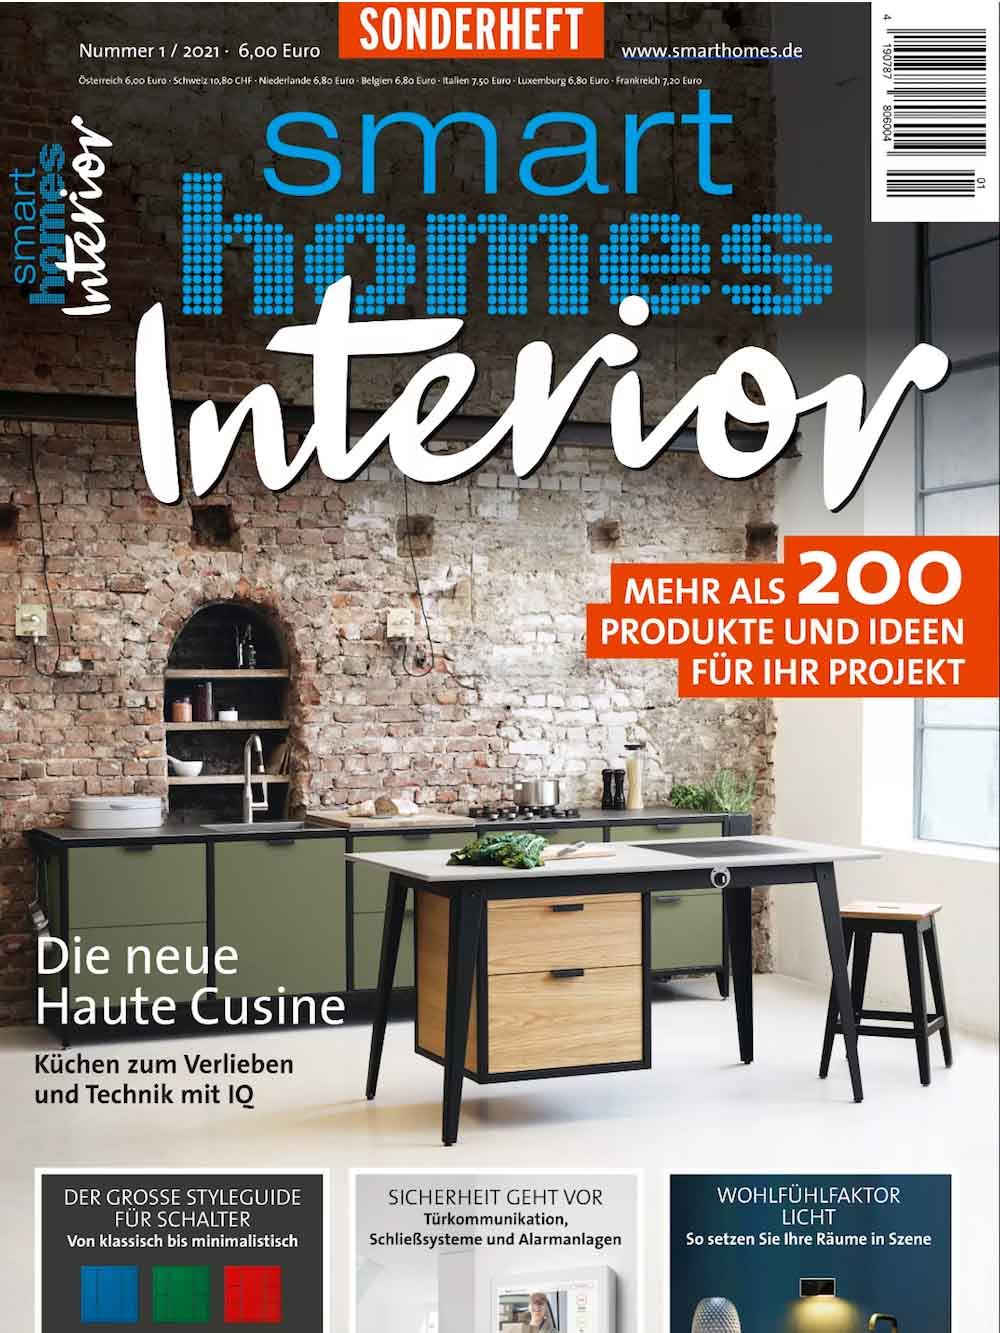 Smart ELOA UNIQUE LIGHTS Home Interior_1-21_Cover